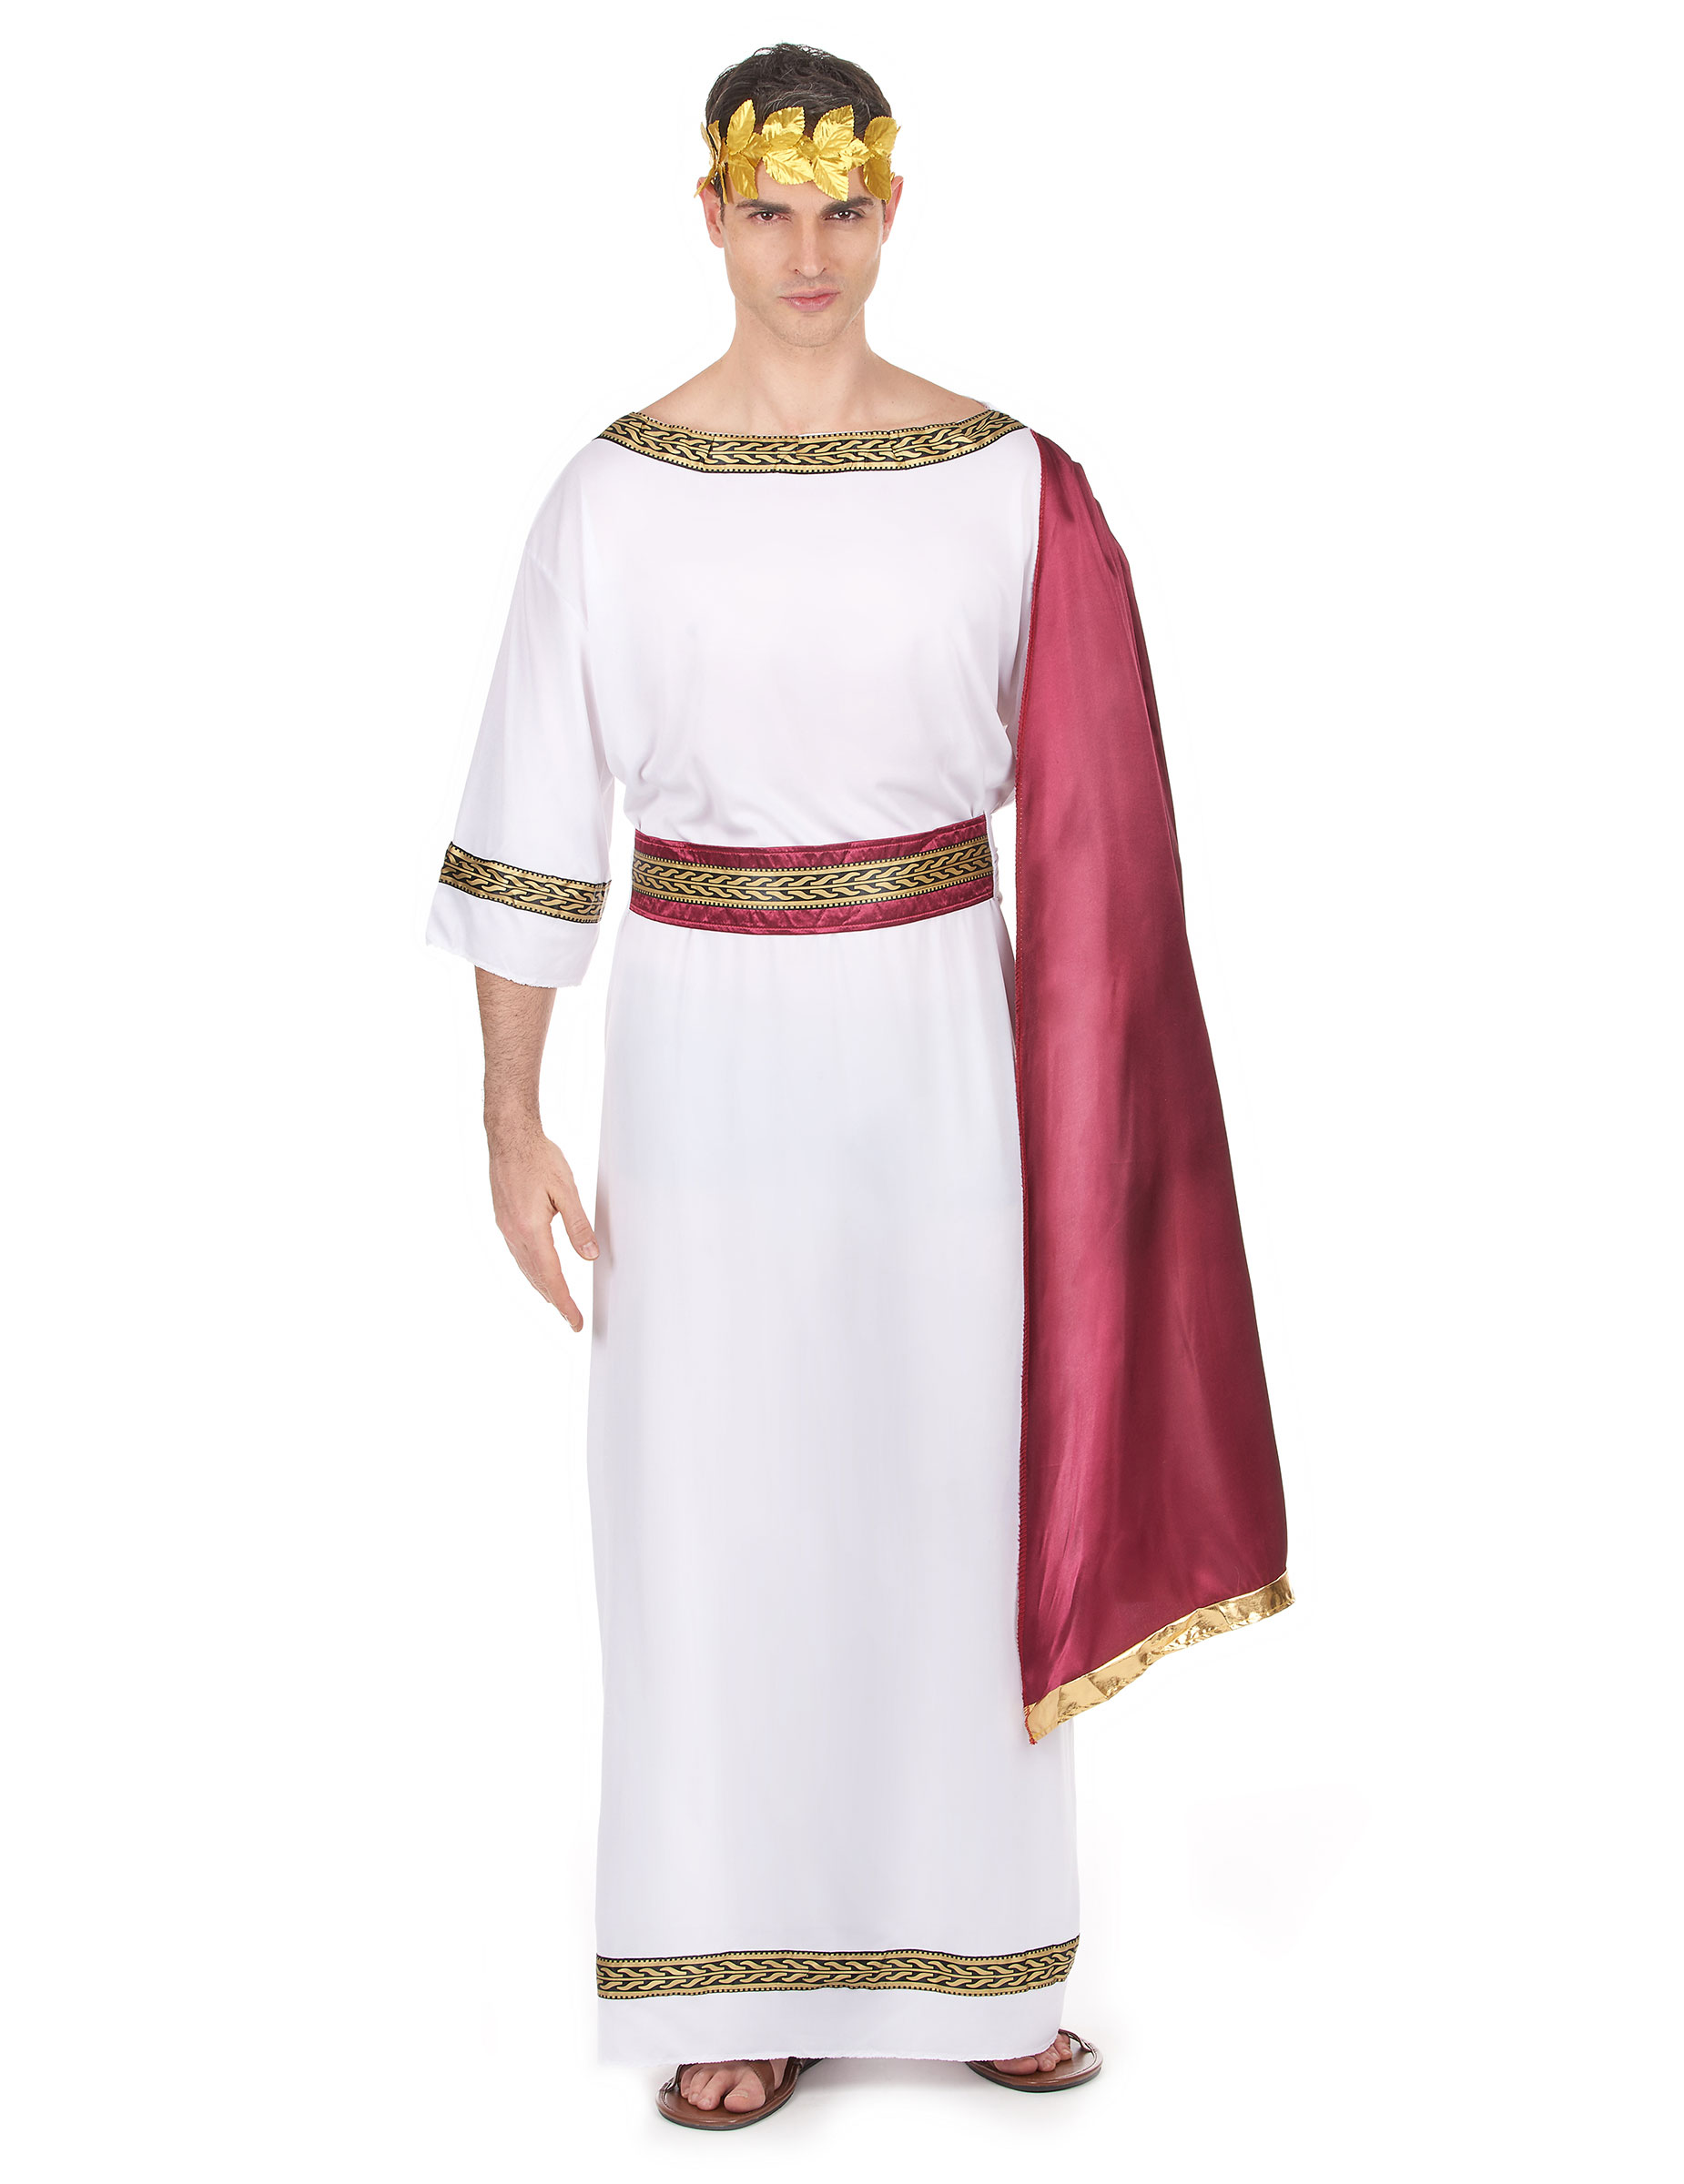 Costumes grecs antiques - Deguisement grece antique ...